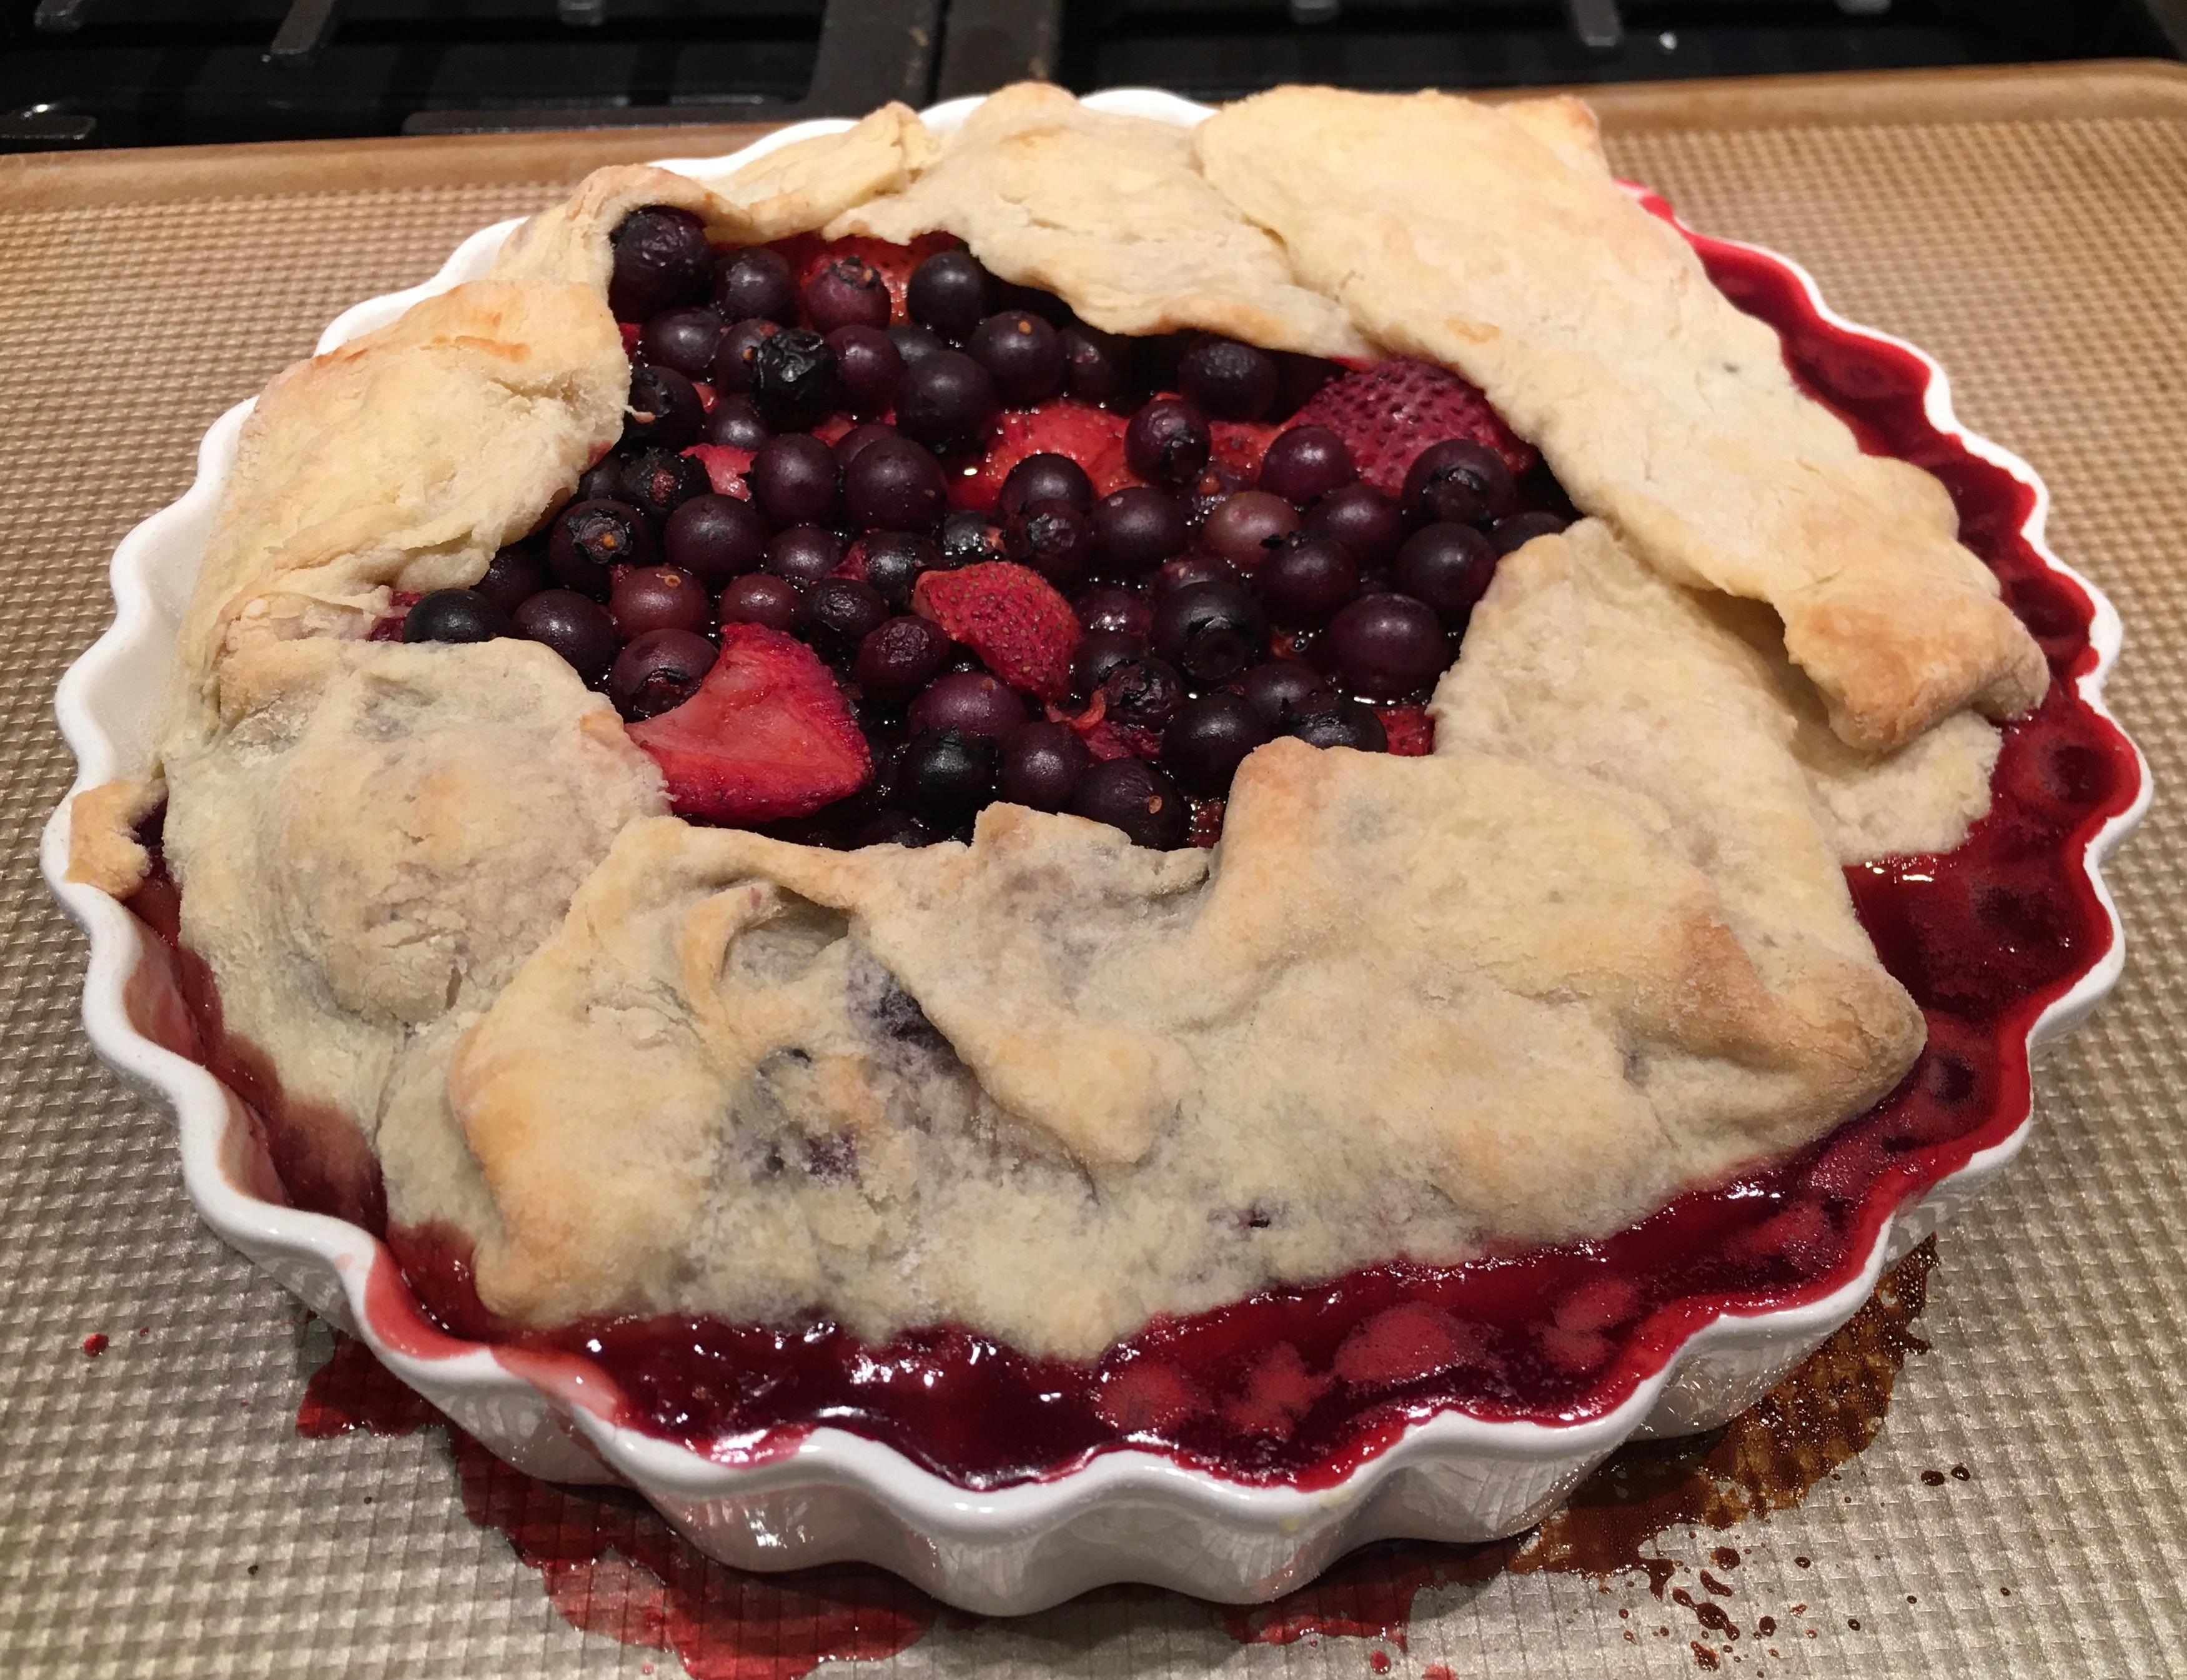 fresh baked berry galette